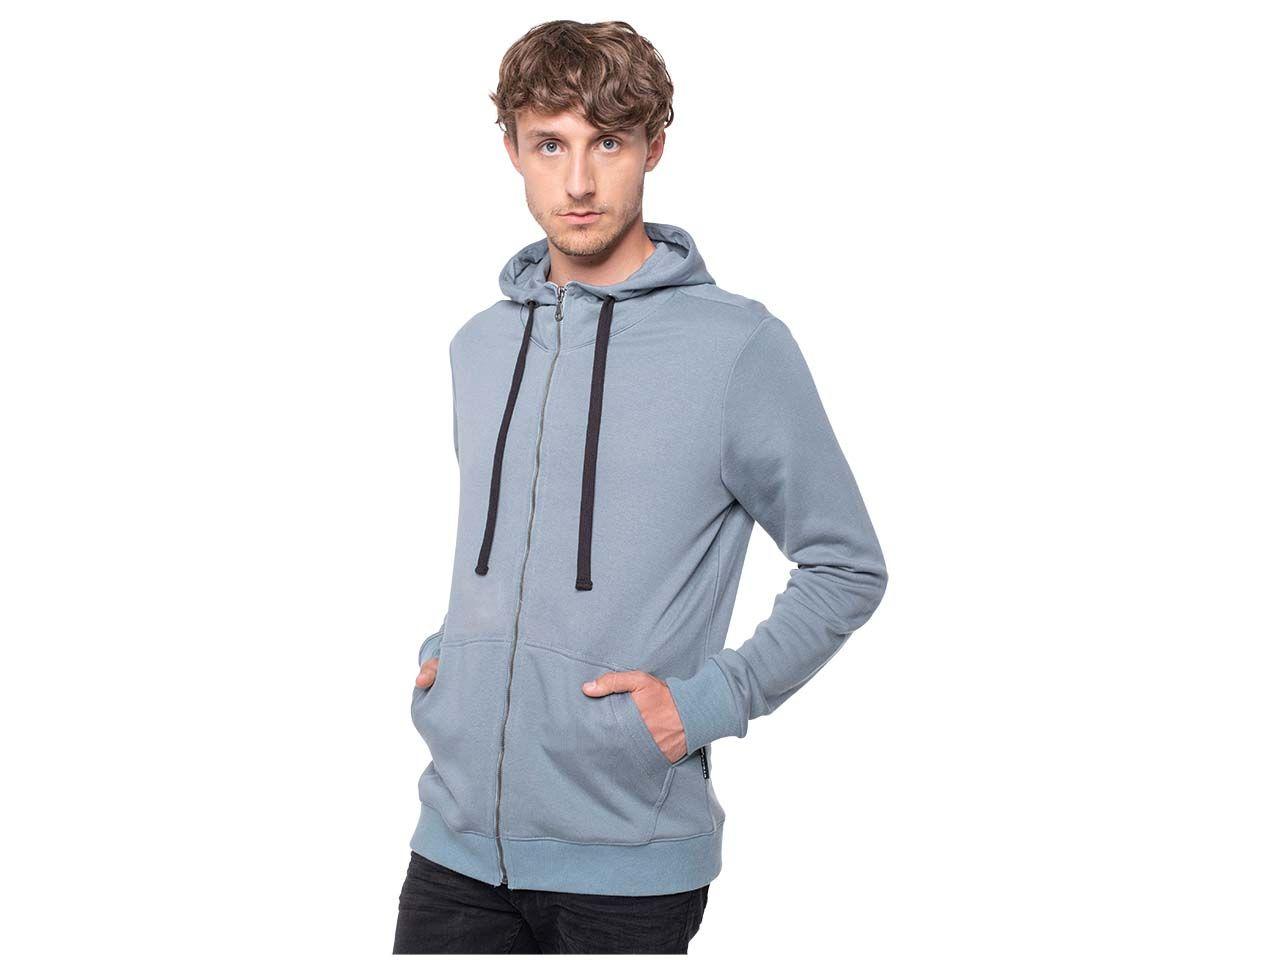 erdbär Herren-Zip-Hoody aus Lenzing Modal, goblin blue, Gr. XL H501